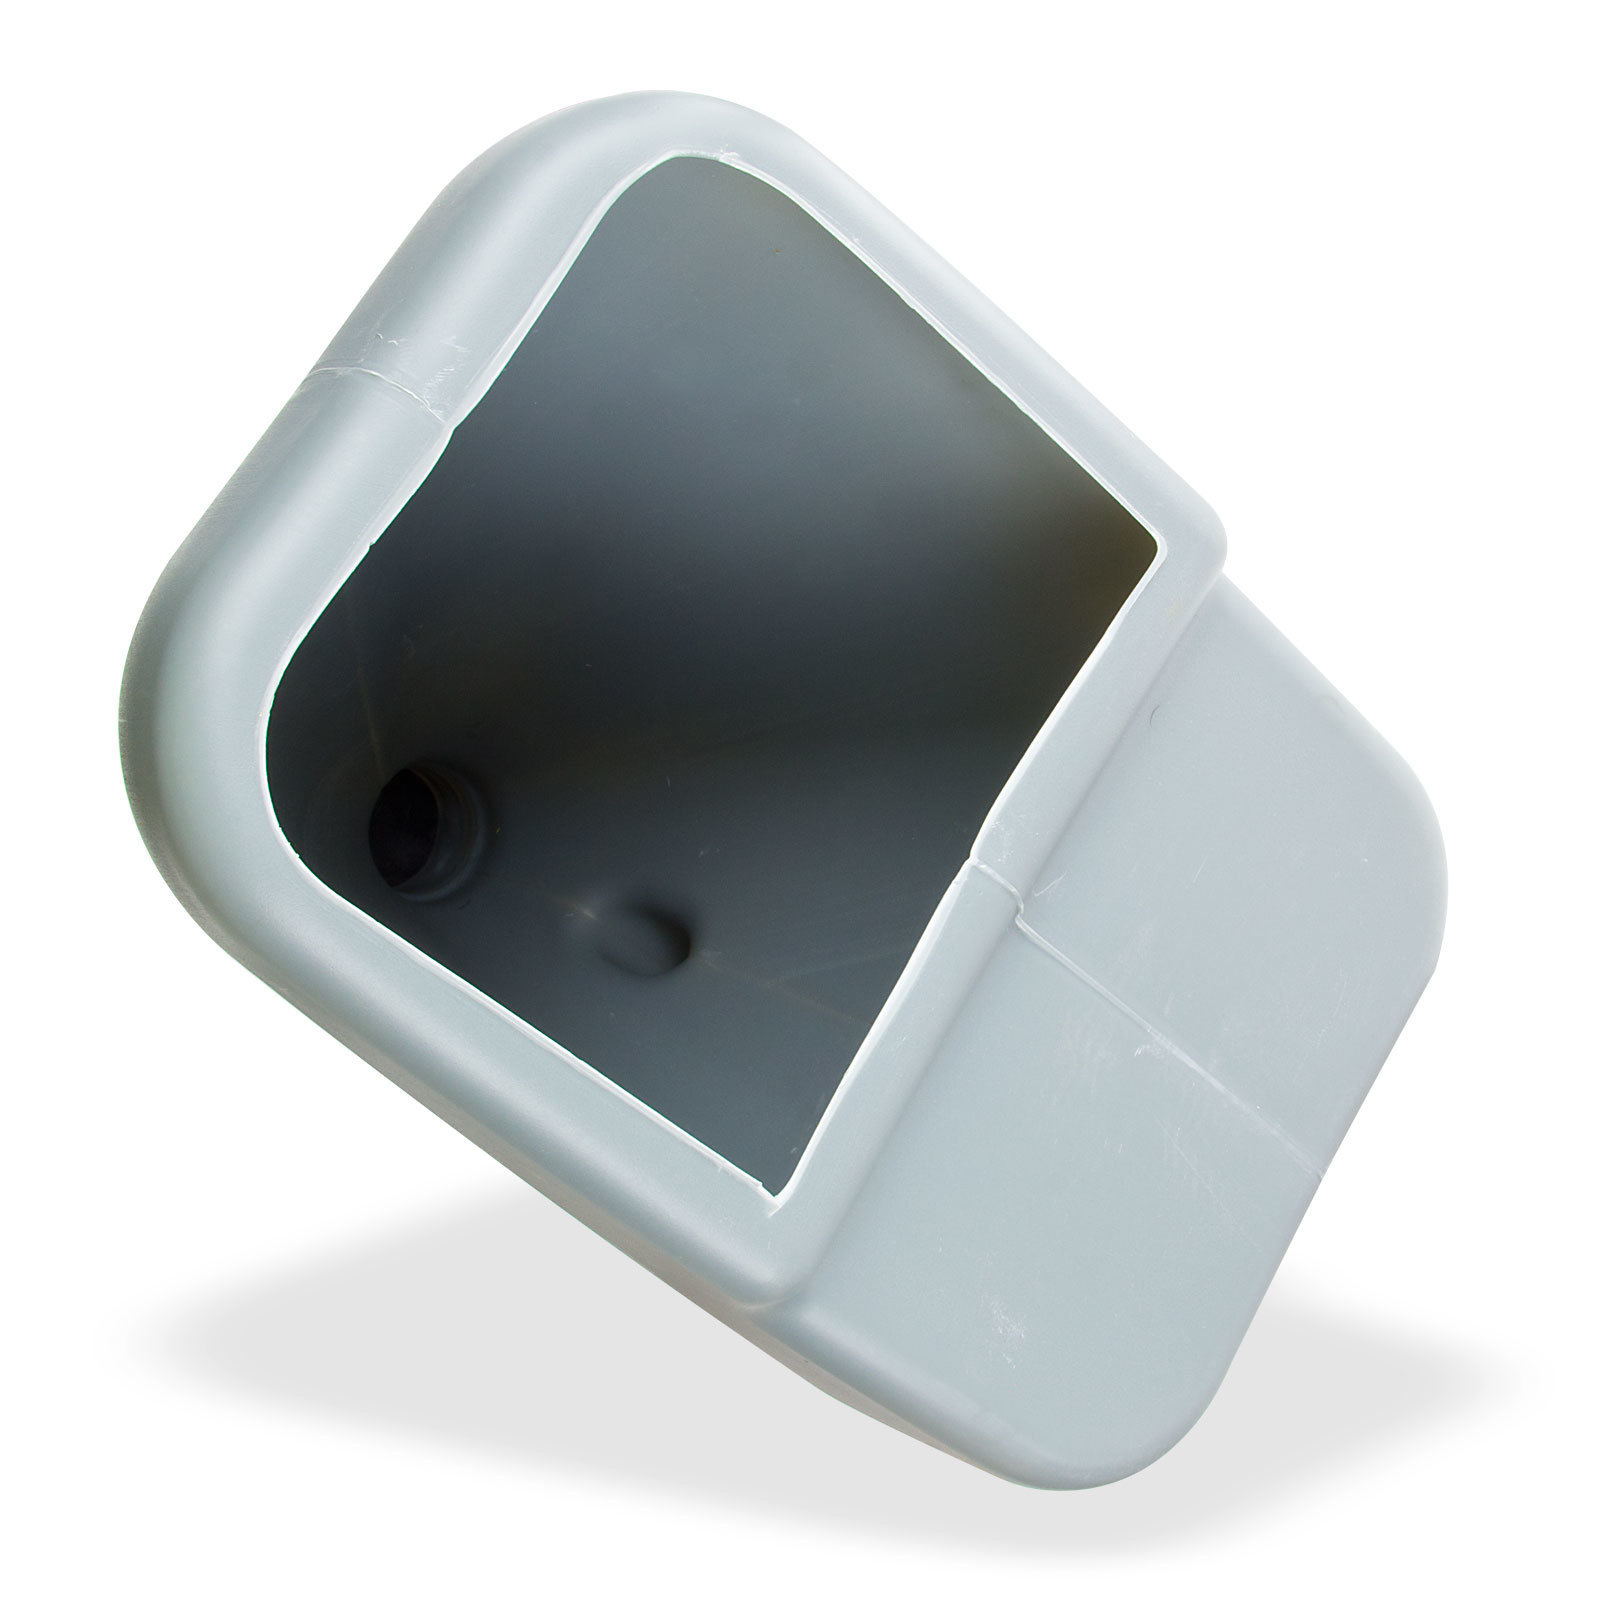 druckluft wei elspritze farbspritze farbspr hpistole farbspr her kalkspritze ebay. Black Bedroom Furniture Sets. Home Design Ideas